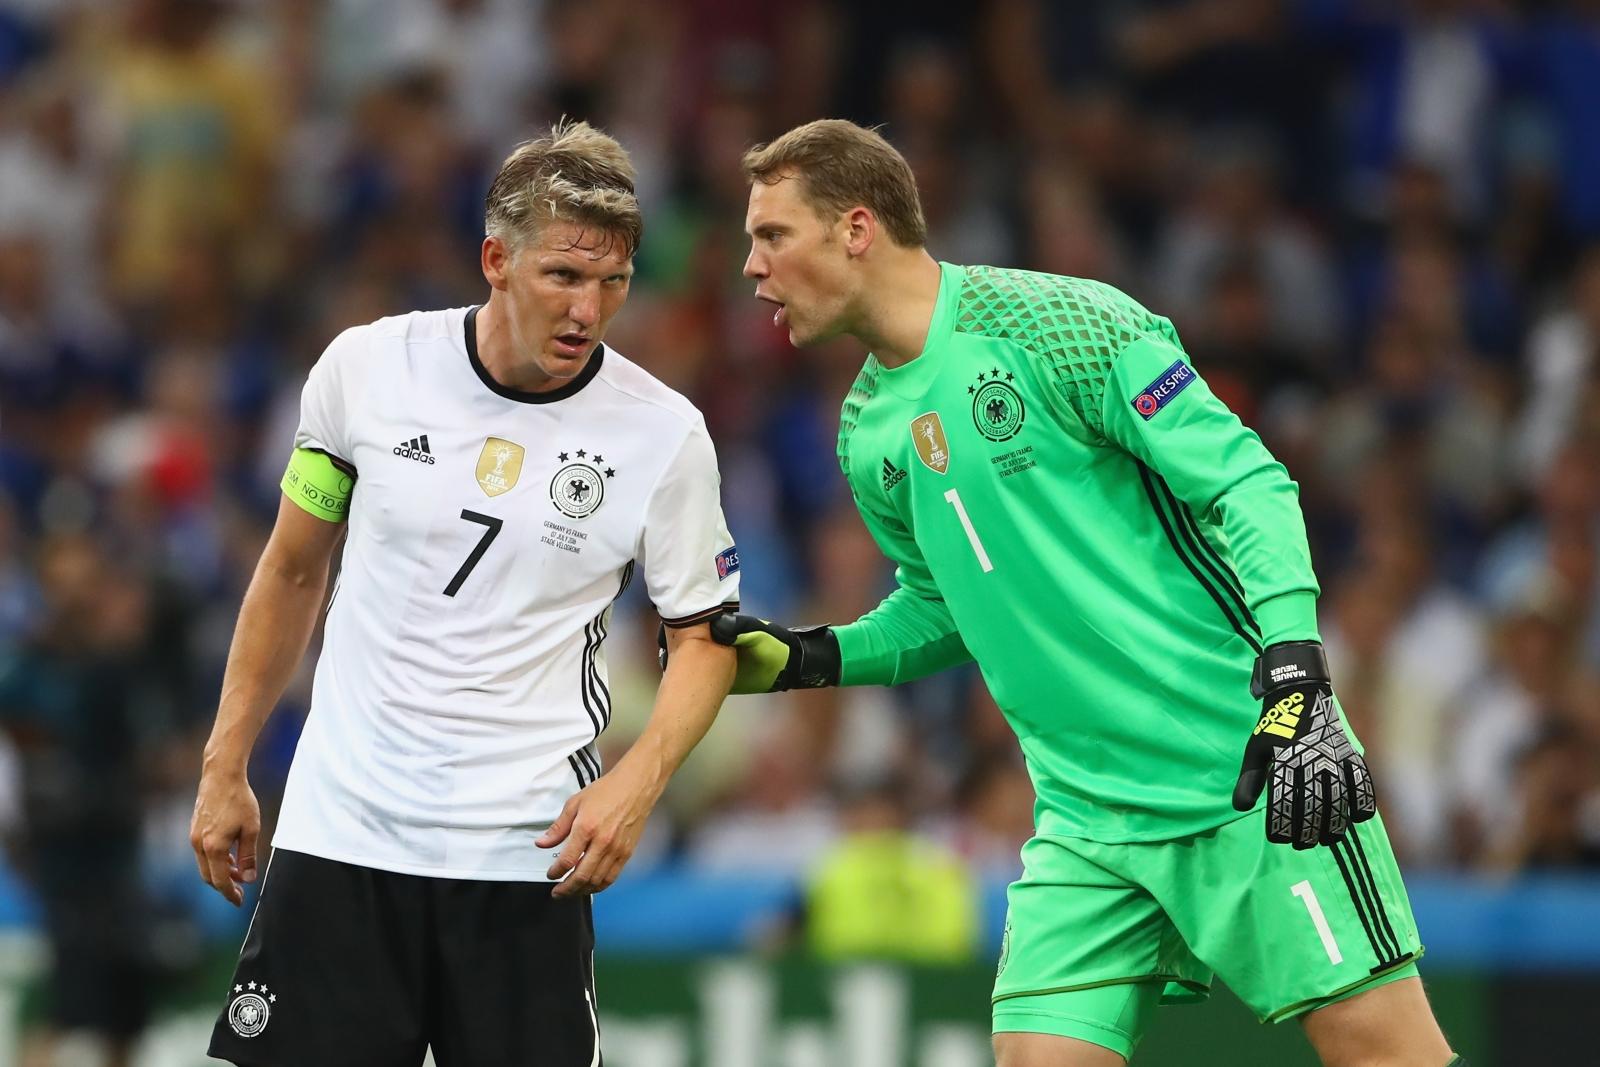 Bastian Schweinsteiger and Manuel Neuer